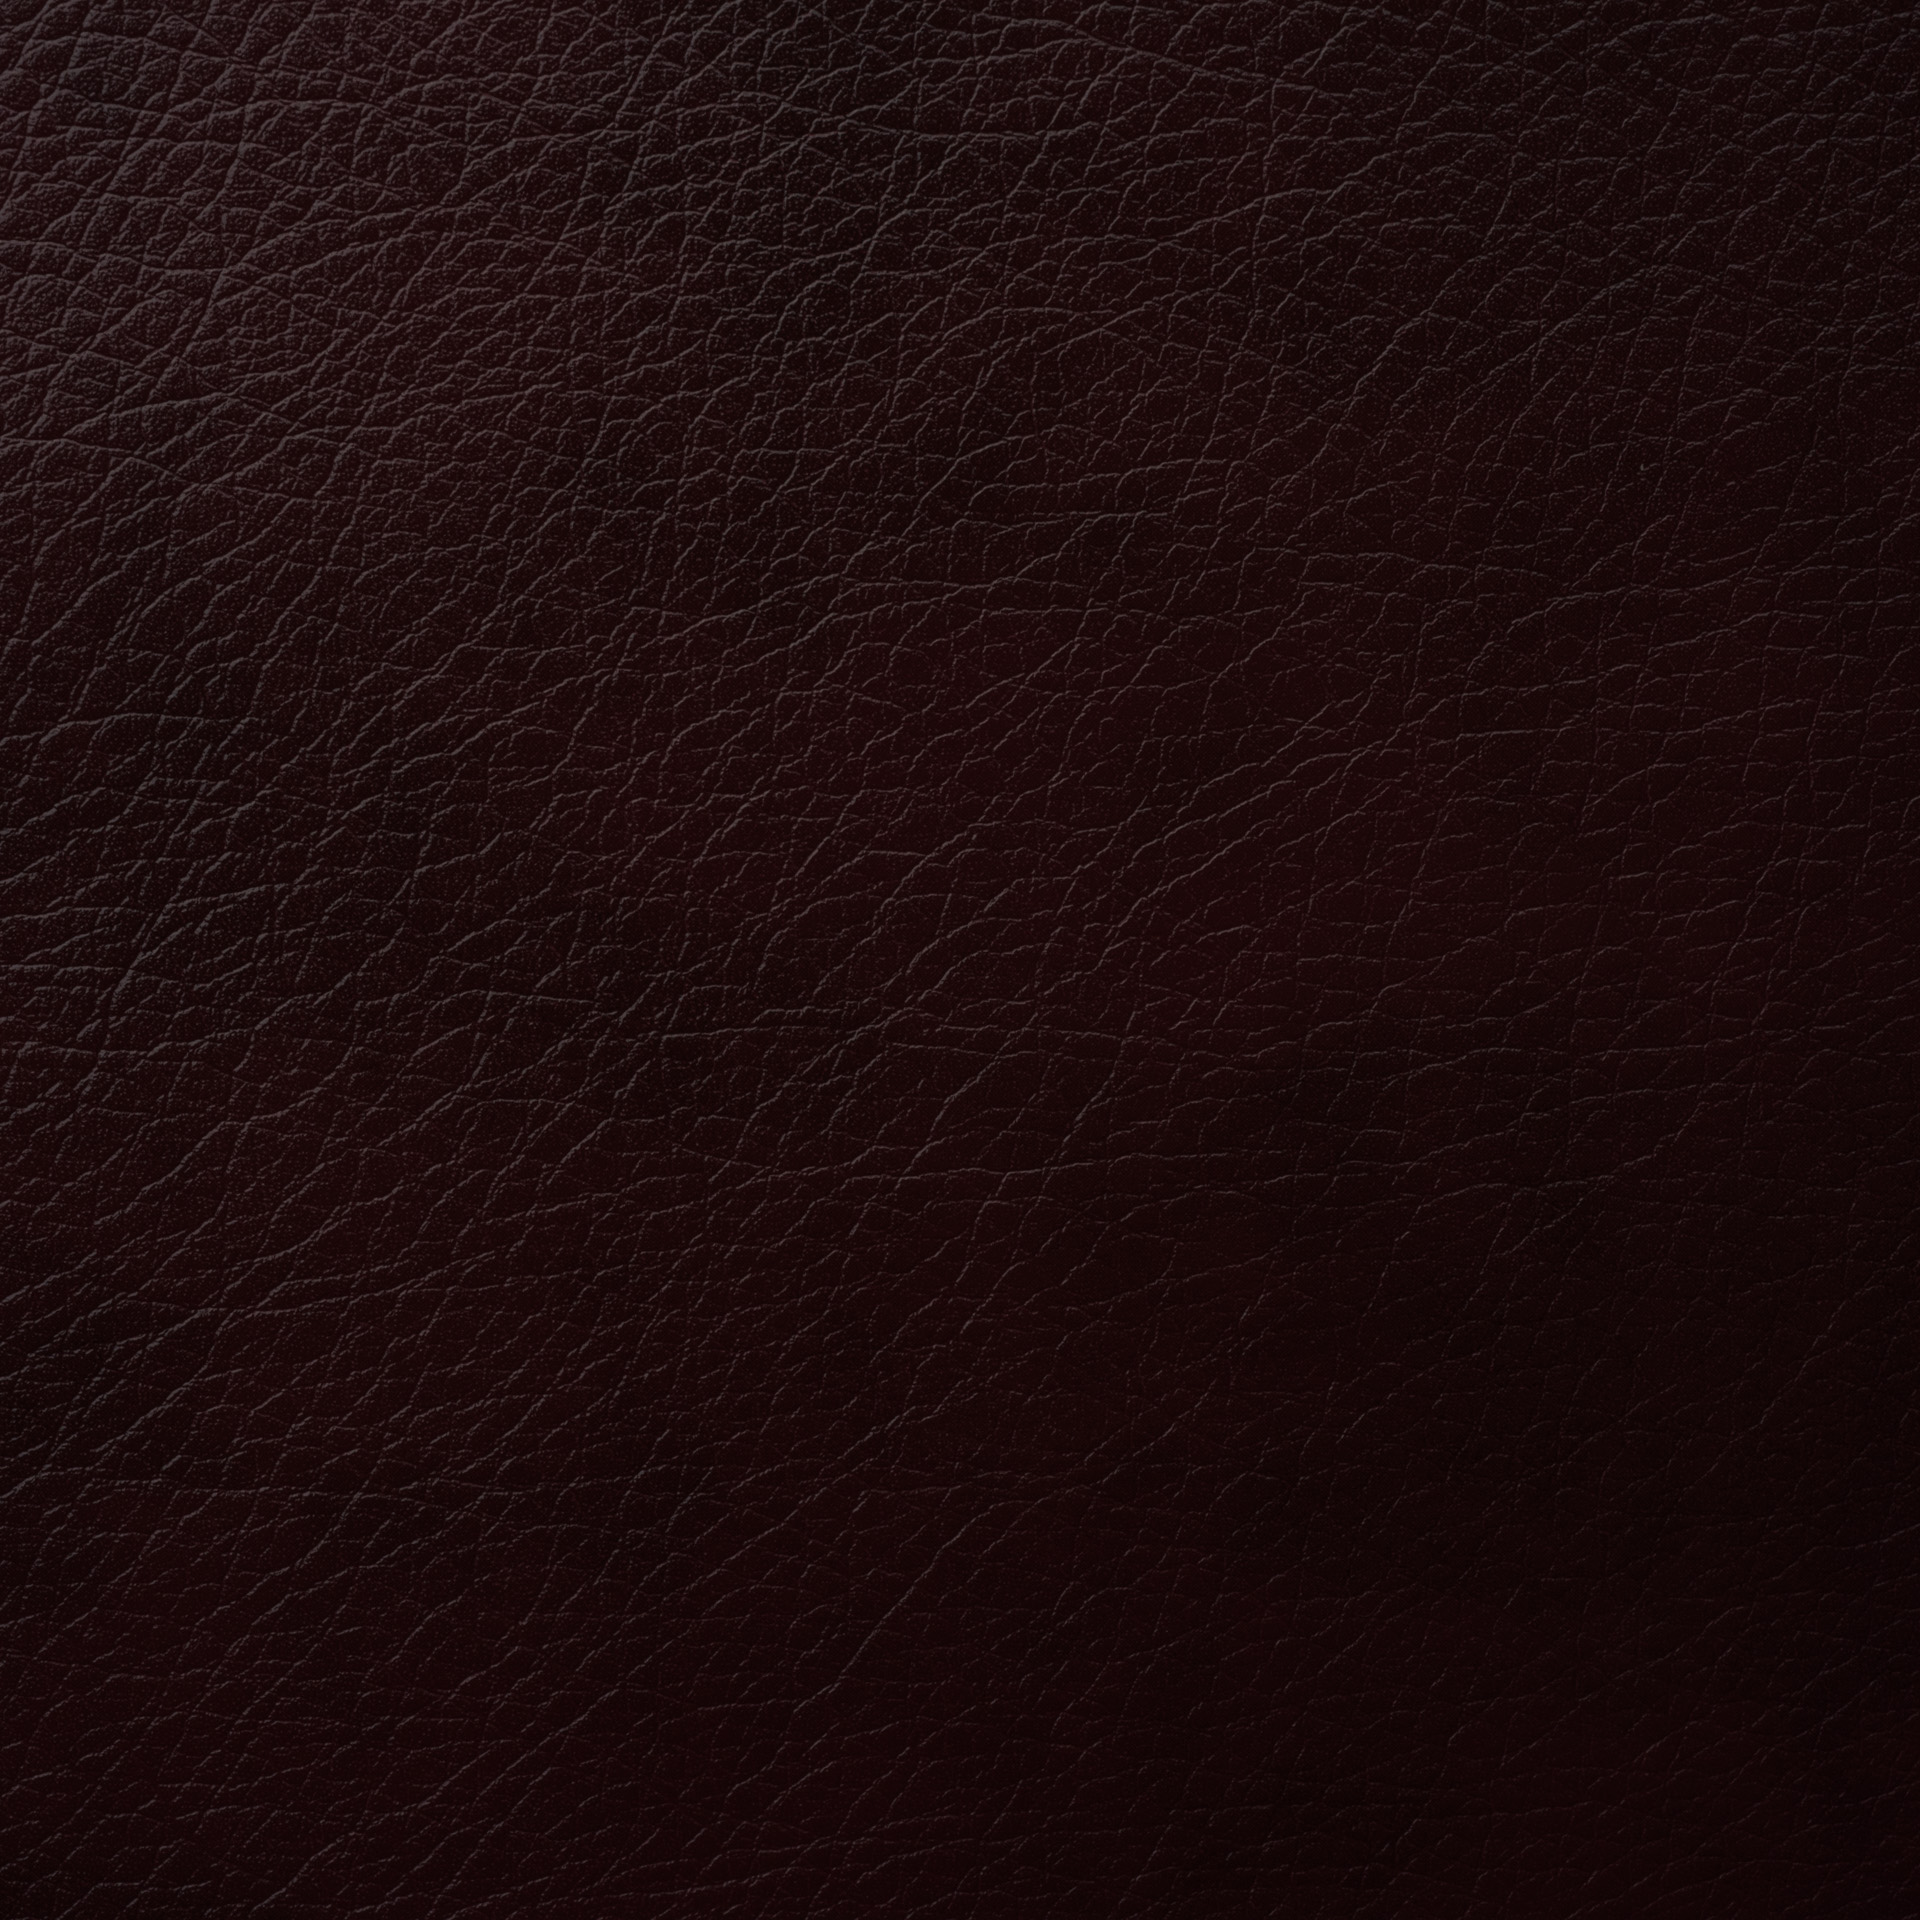 Коллекция ткани Титан BORDO,  купить ткань Кож зам для мебели Украина